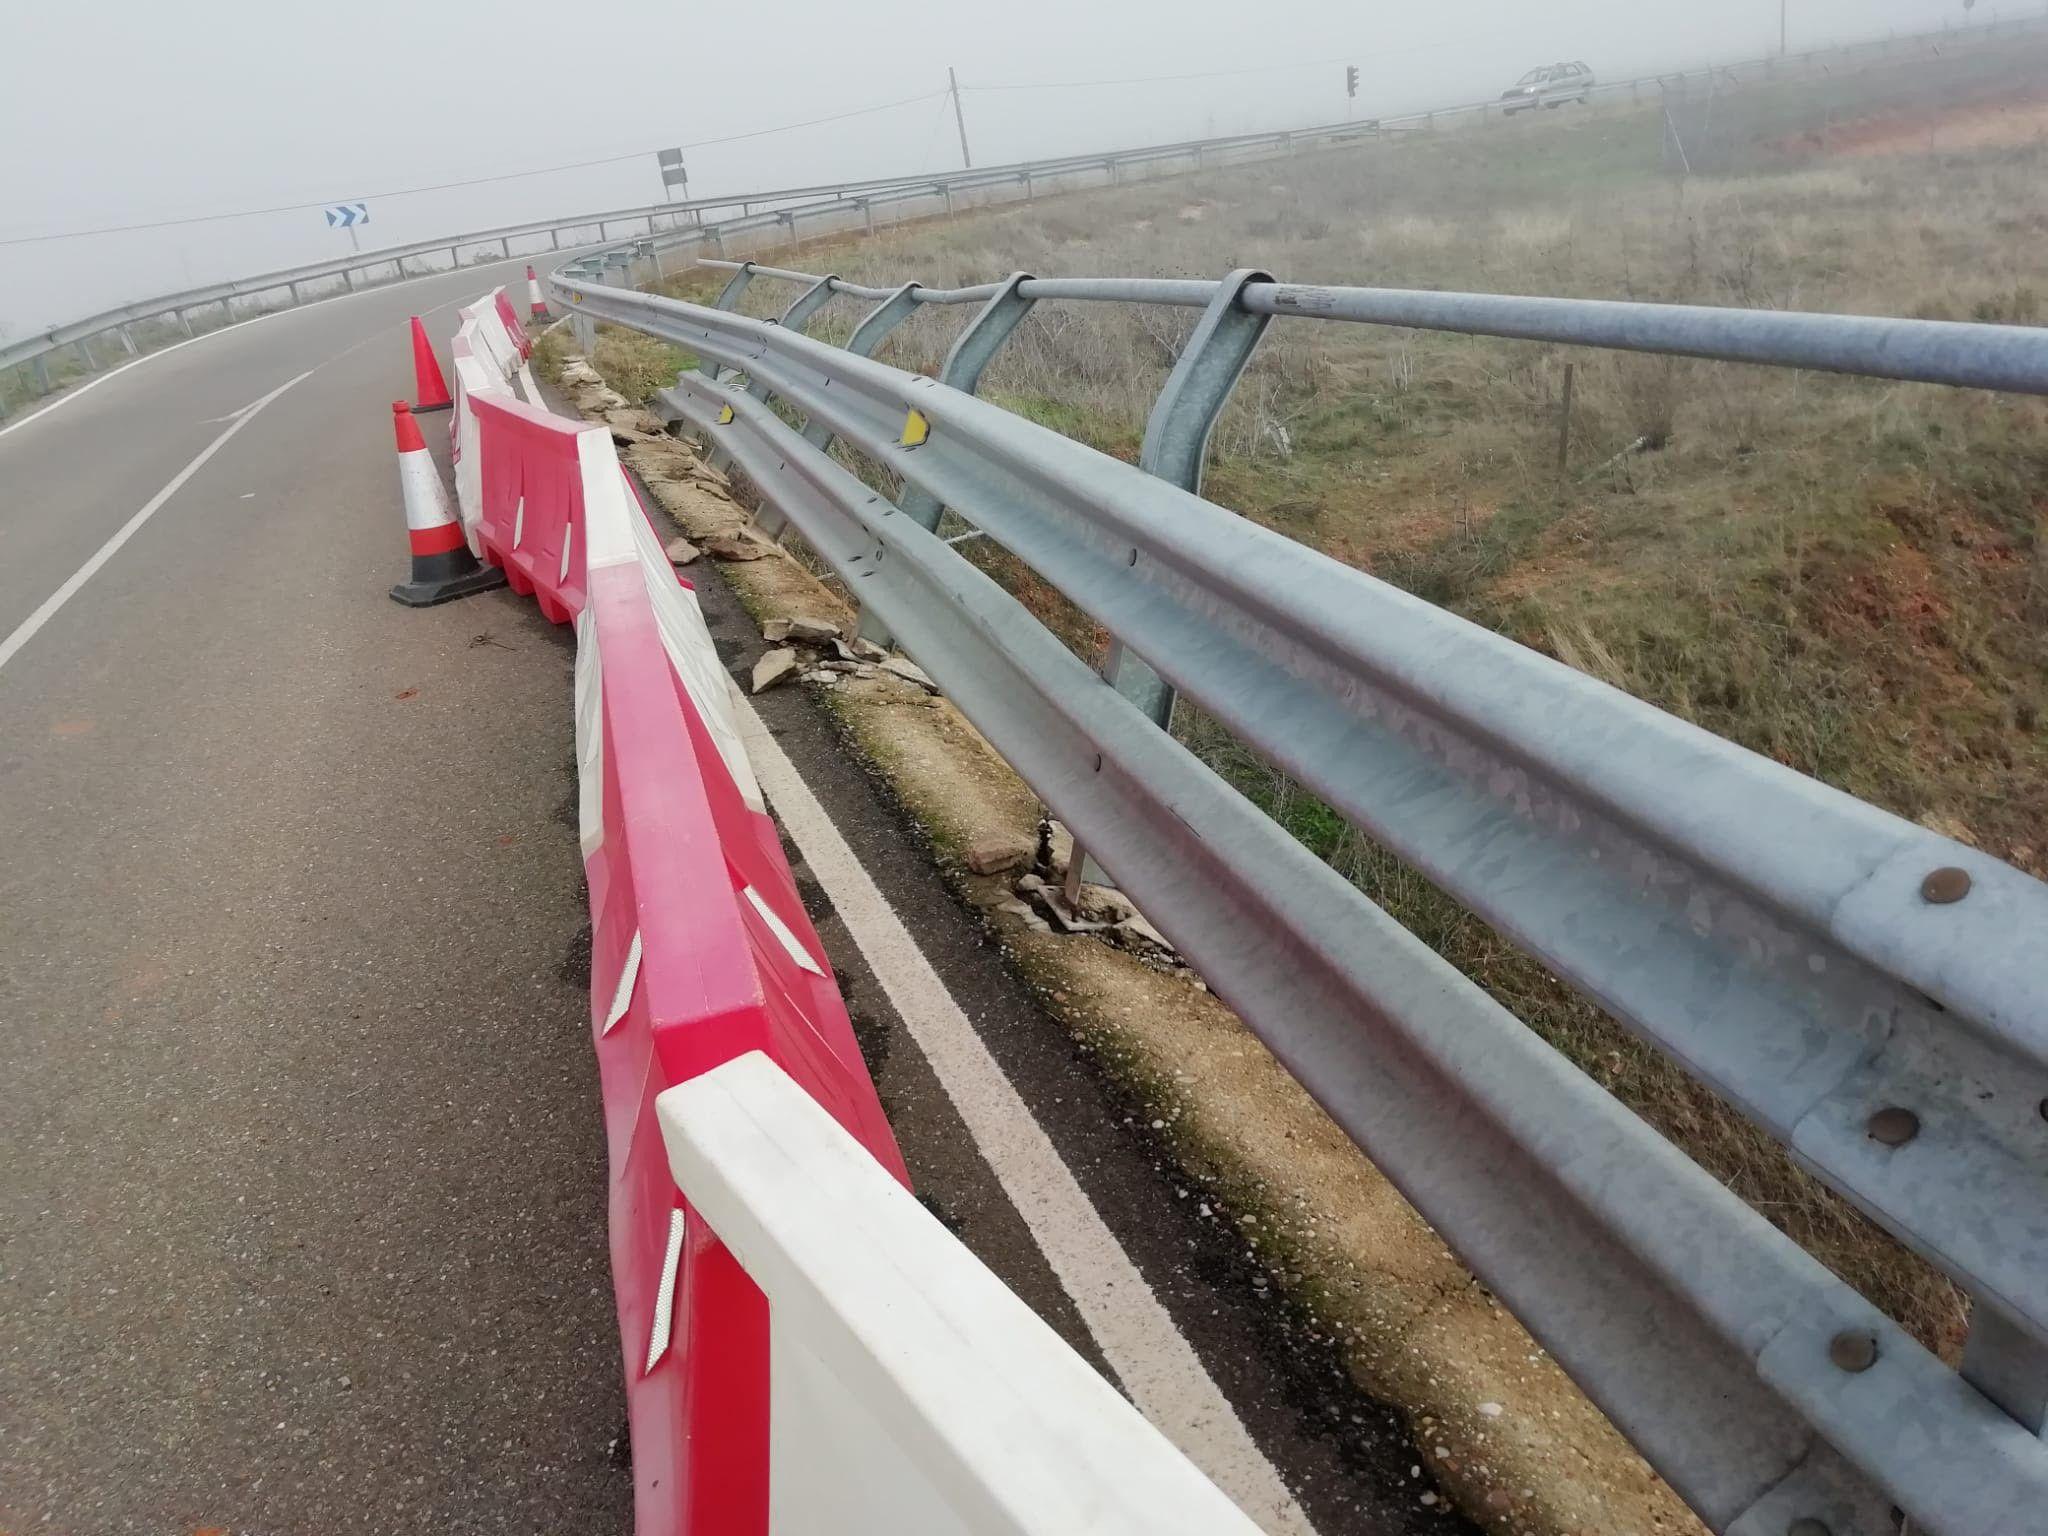 Andavias viaducto tren psoe accidente (2)